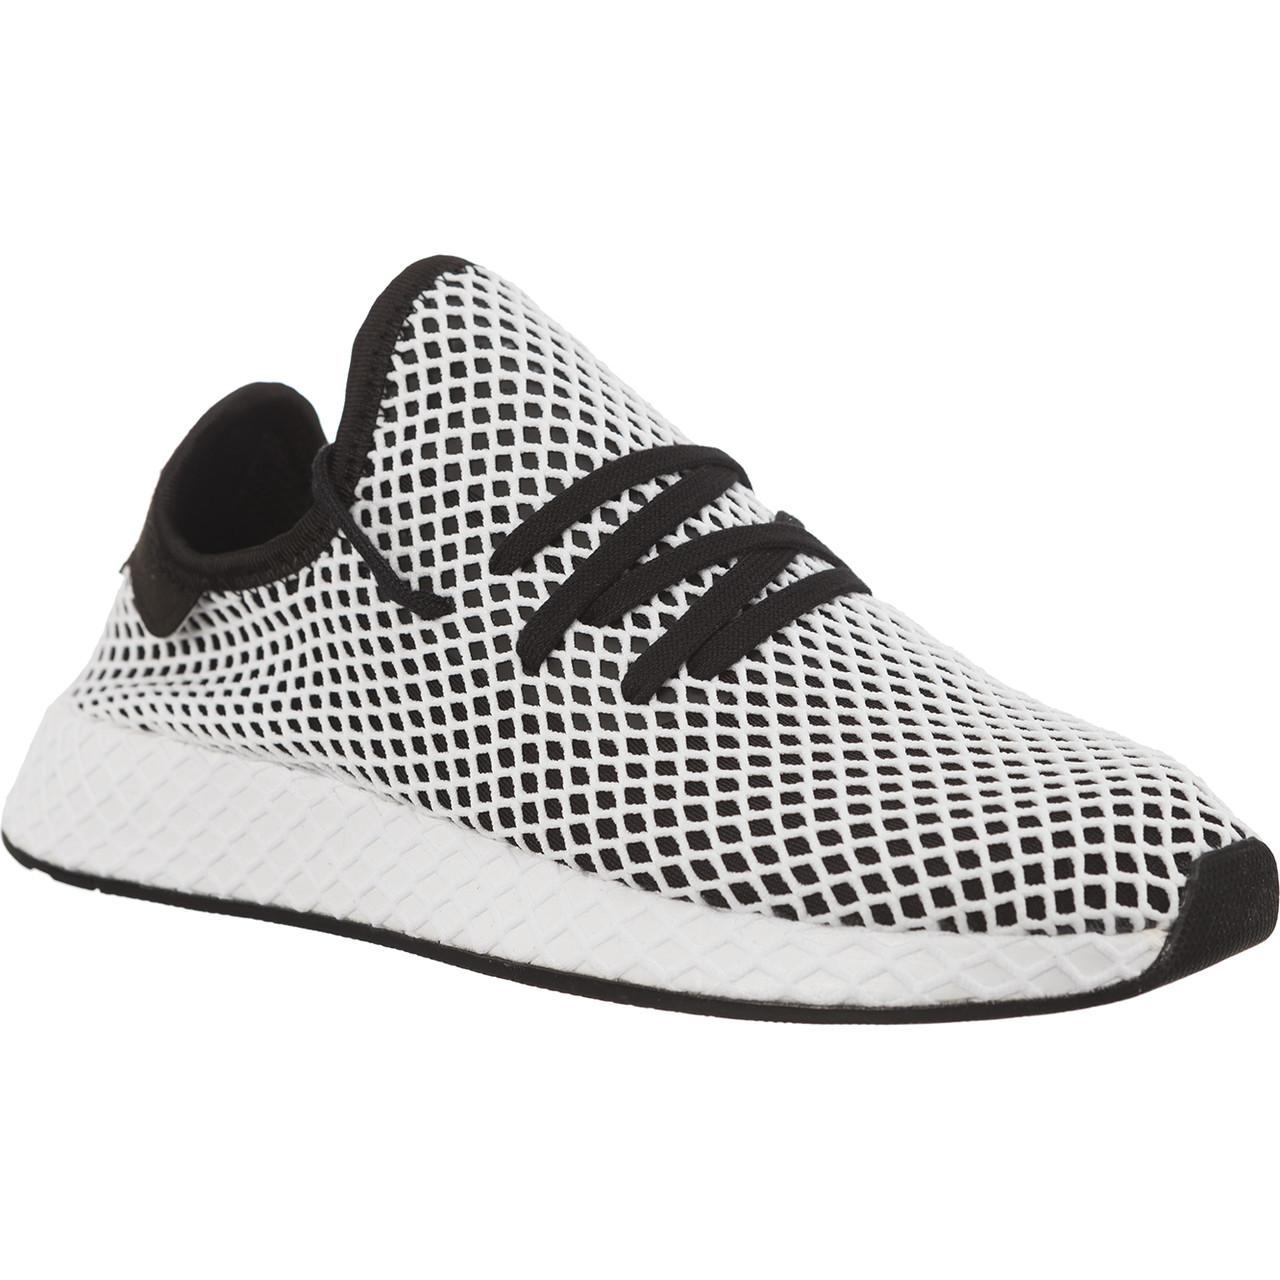 Buty adidas deerupt runner cq2626 nucleo nero / nucleo nero / ftwr white w